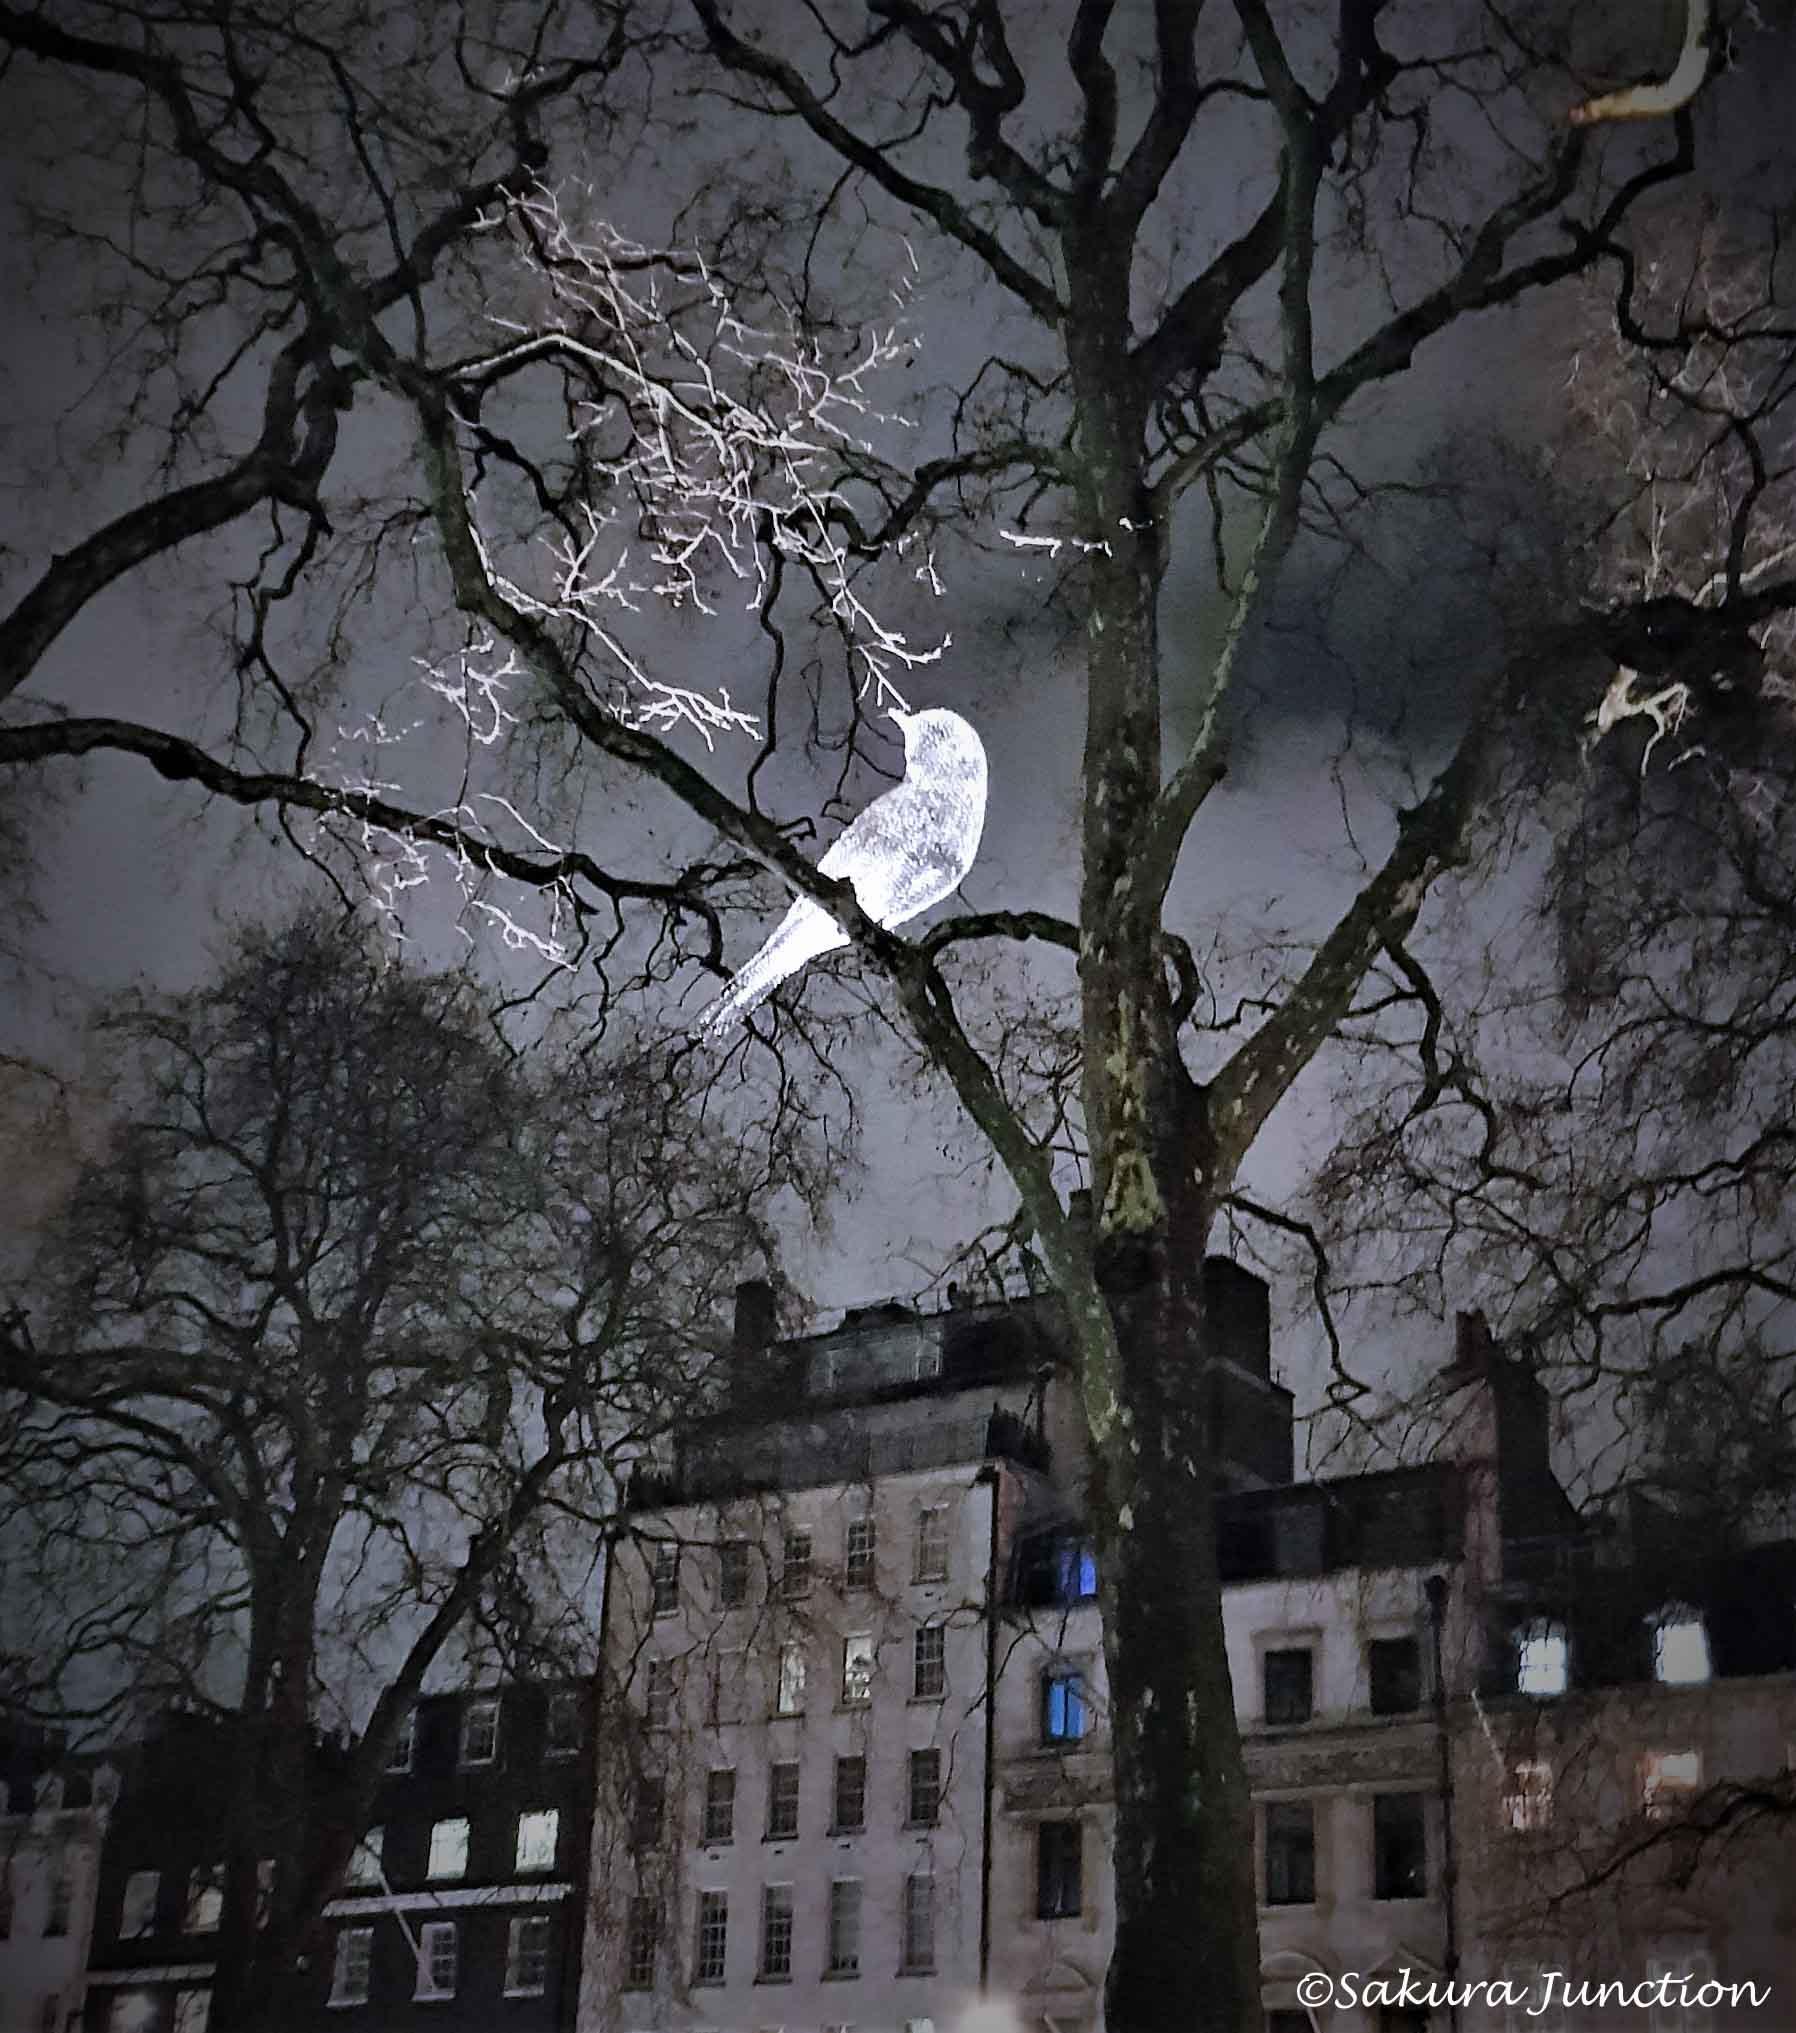 A bird in the night sky